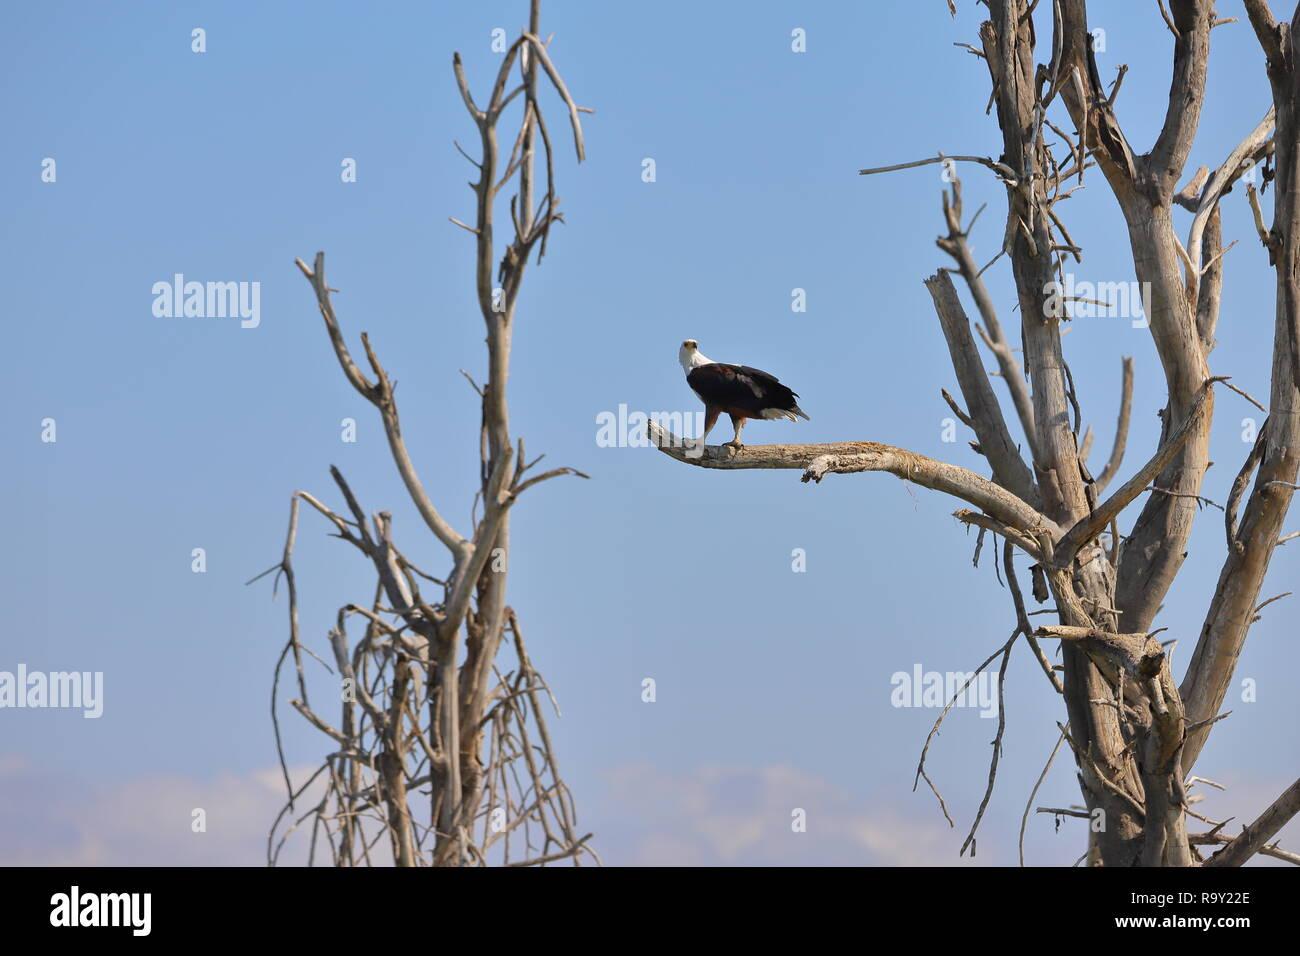 African fish eagle in Kenya - Stock Image